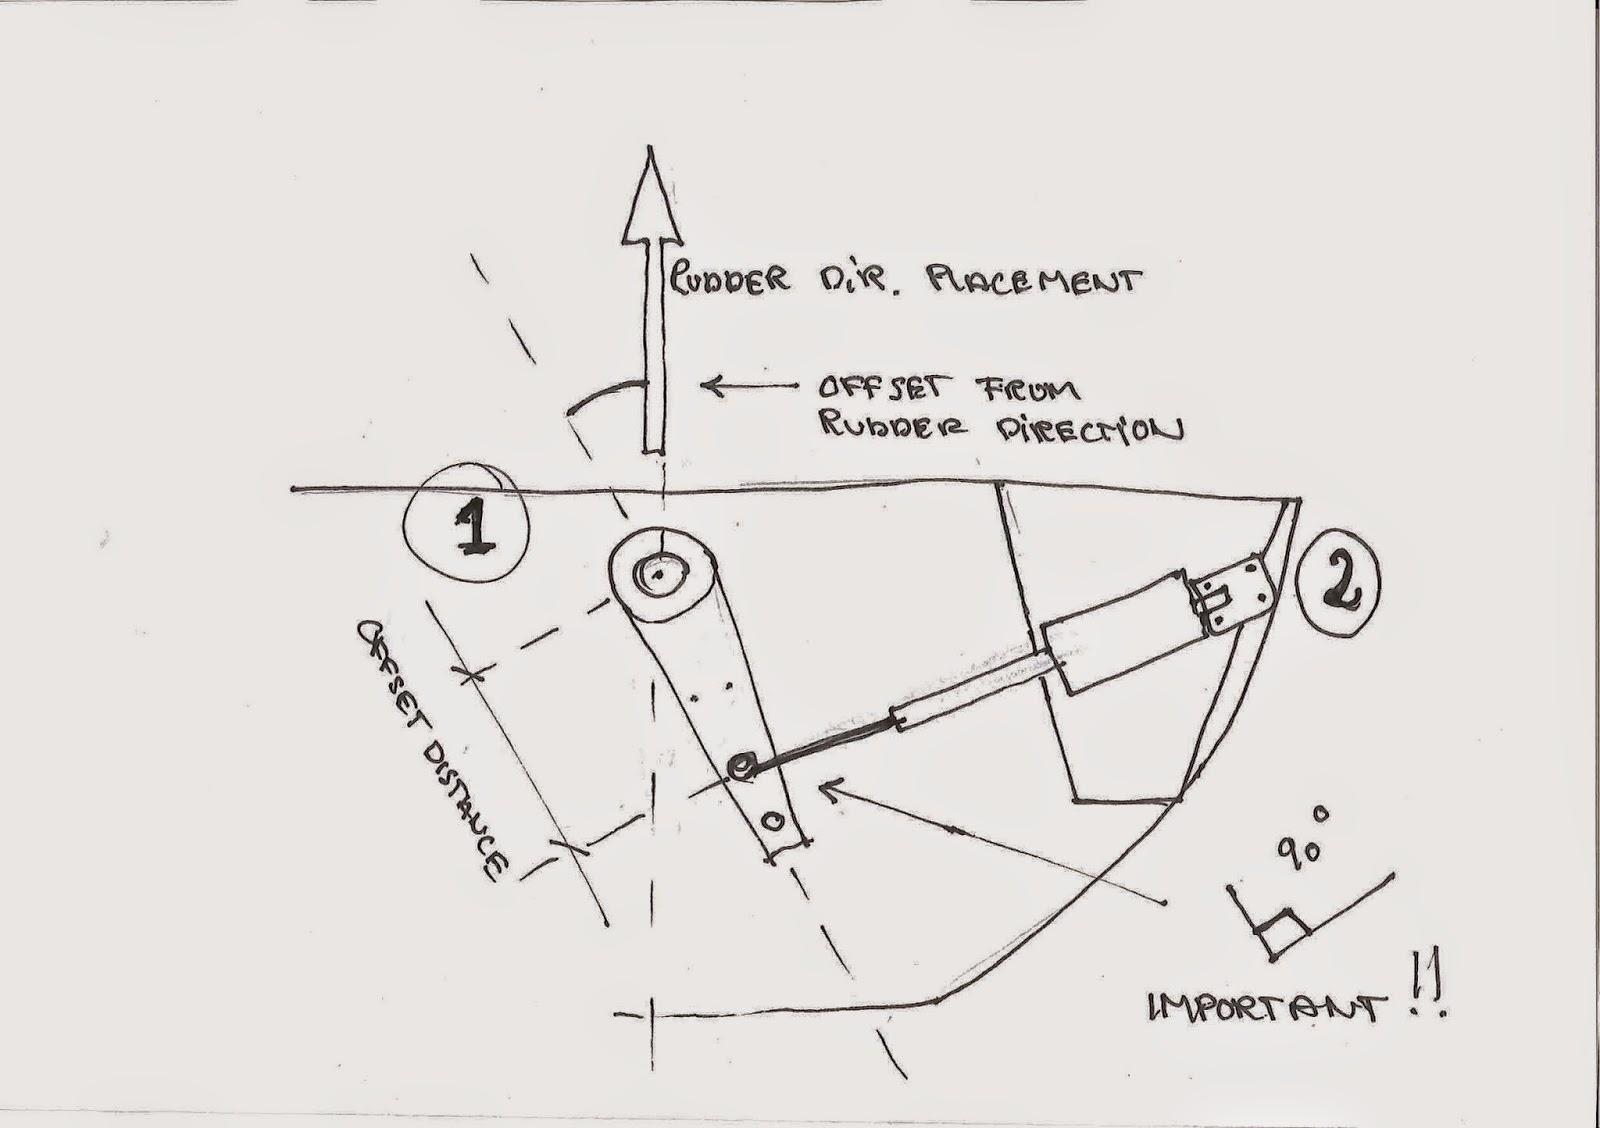 Raymarine Smartpilot Wiring Diagram : 35 Wiring Diagram